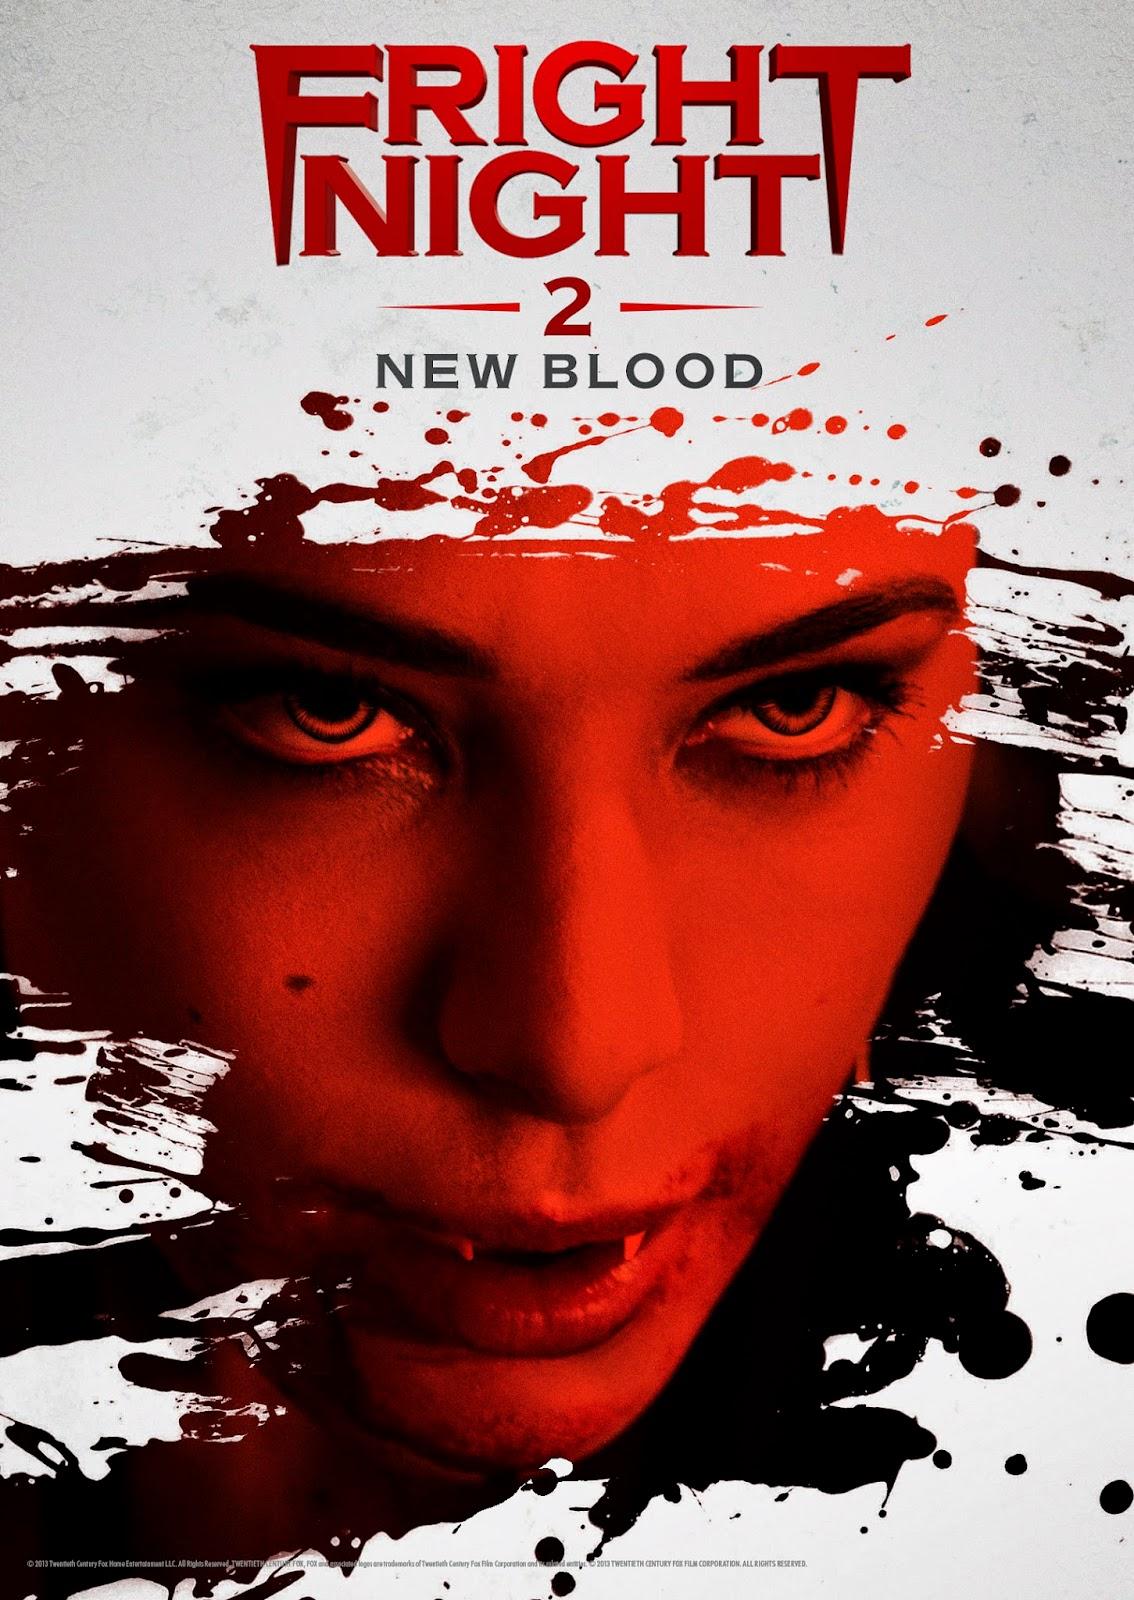 Fright Night 2 (2013) ταινιες online seires xrysoi greek subs